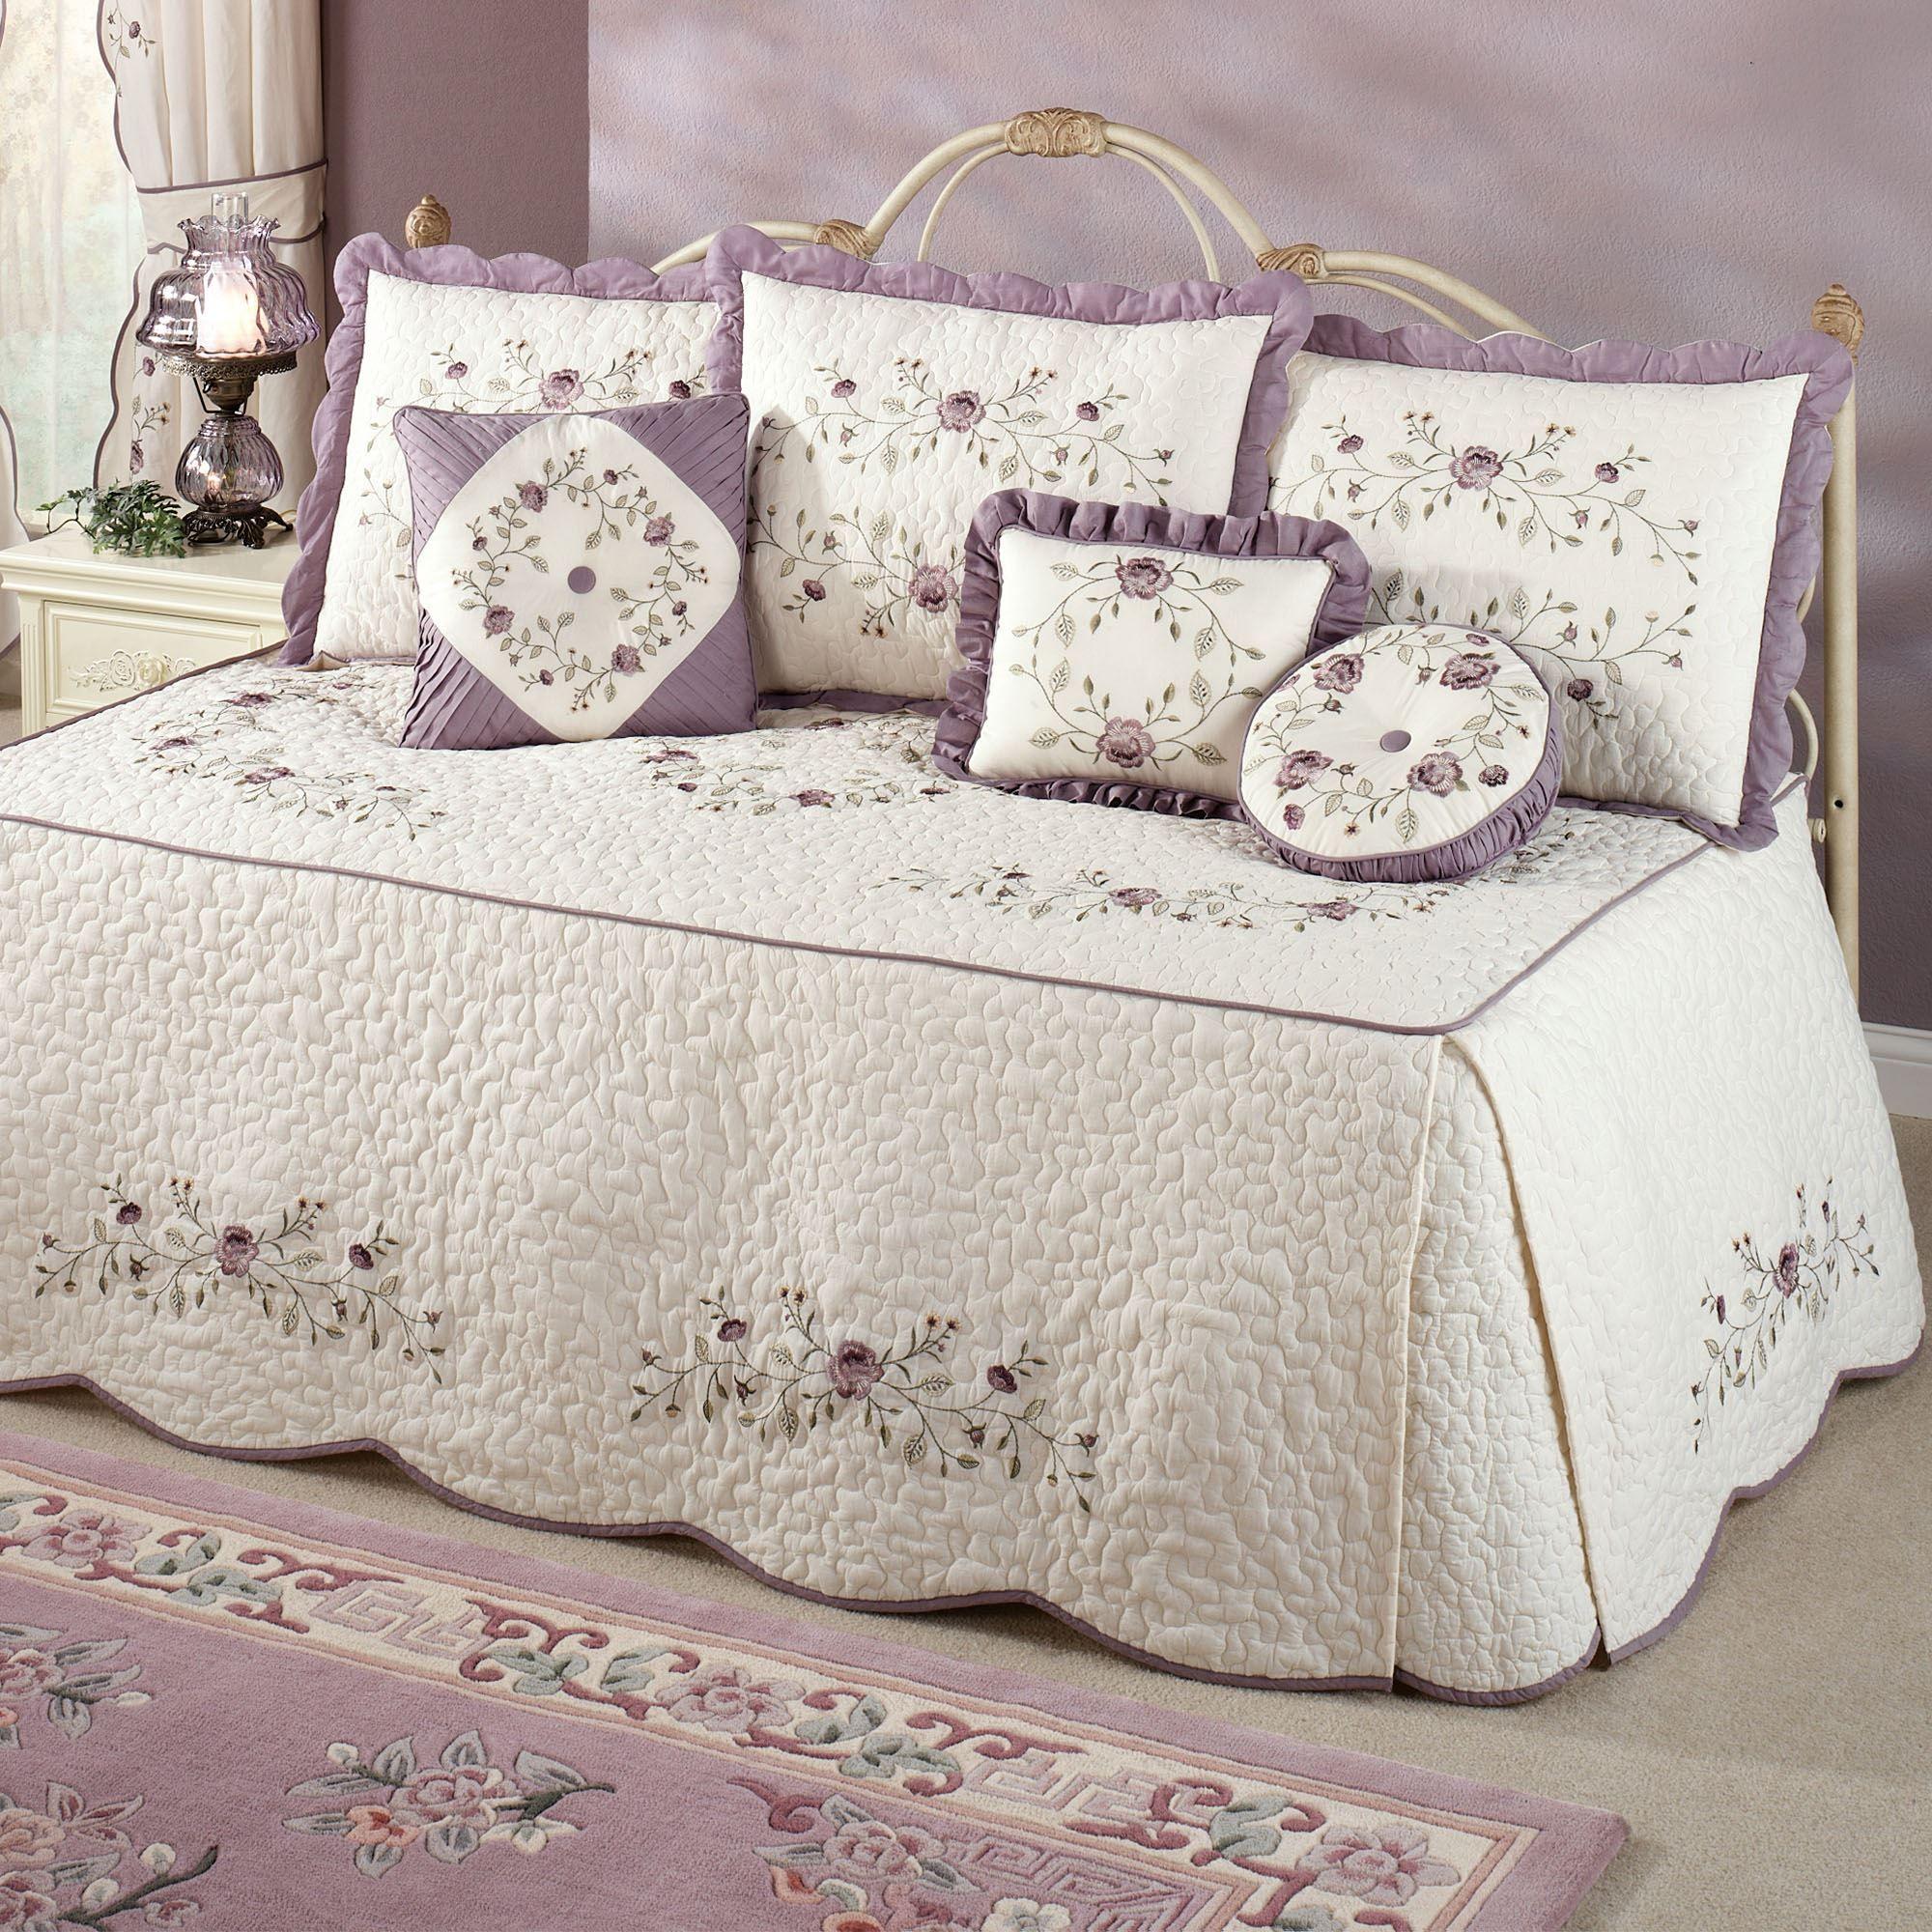 Antique Bloom 4 Pc Daybed Bedding Set